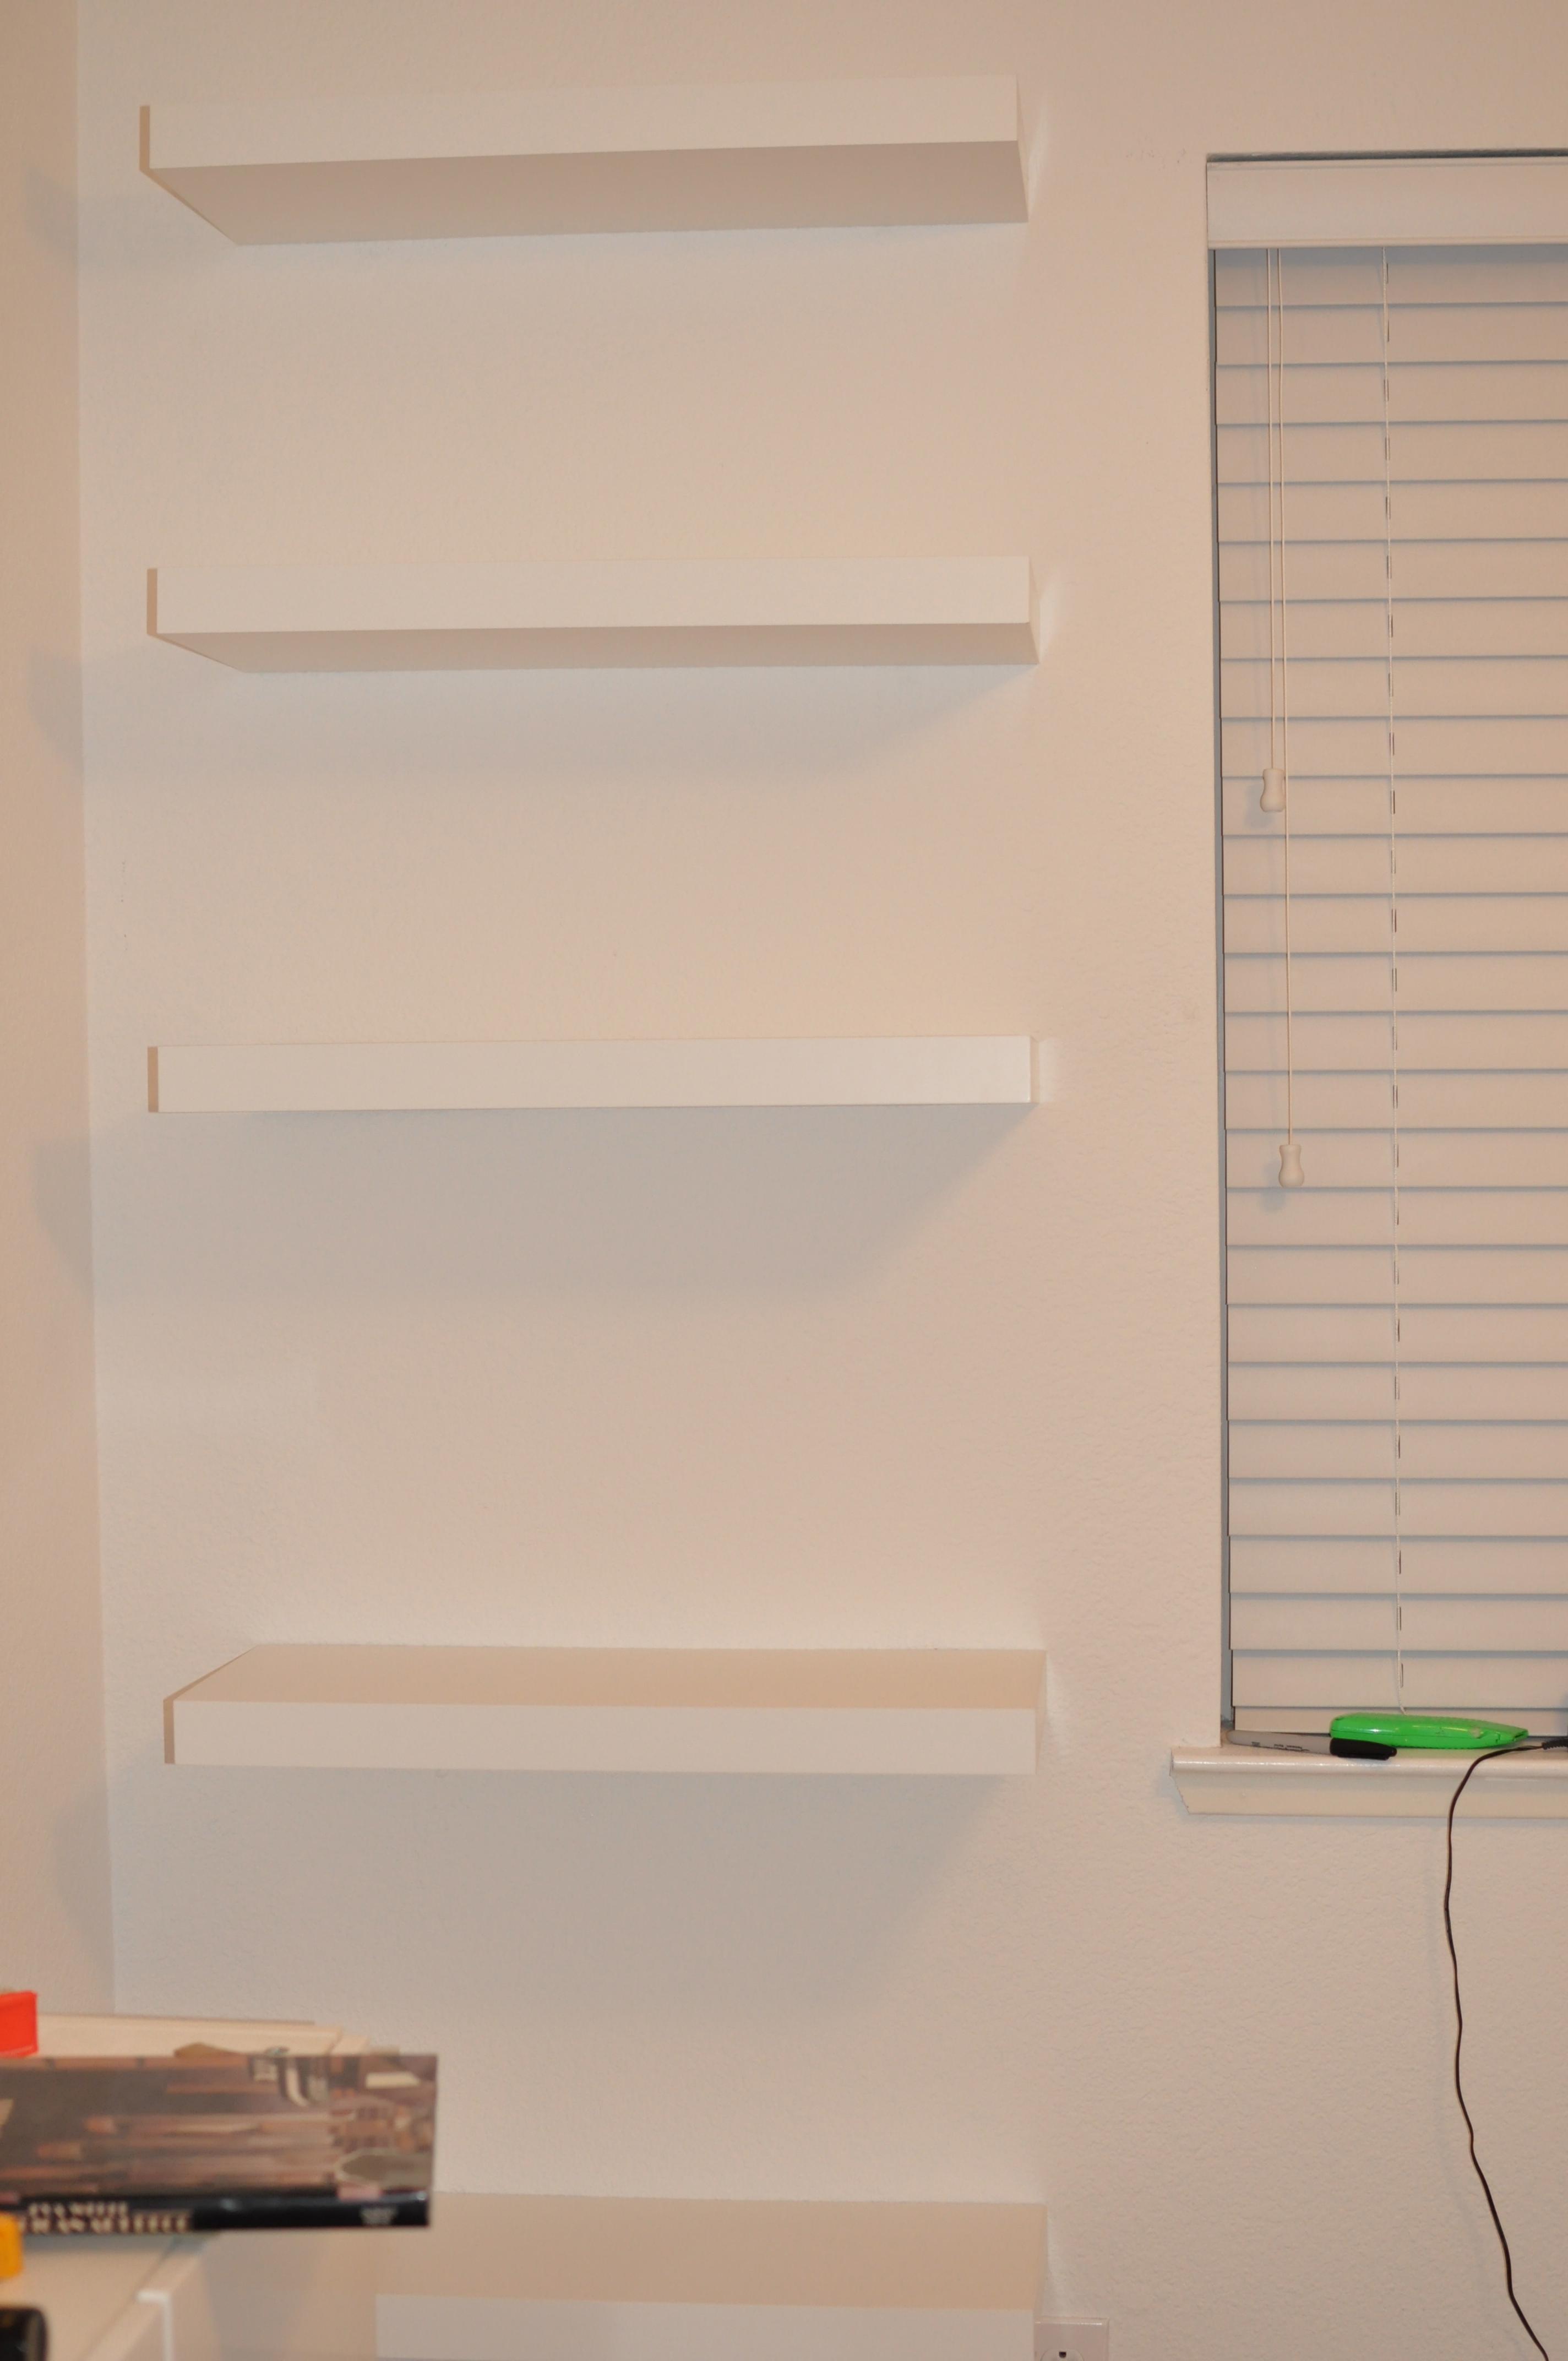 Guest Room Renovations : Guest room renovation useablehours